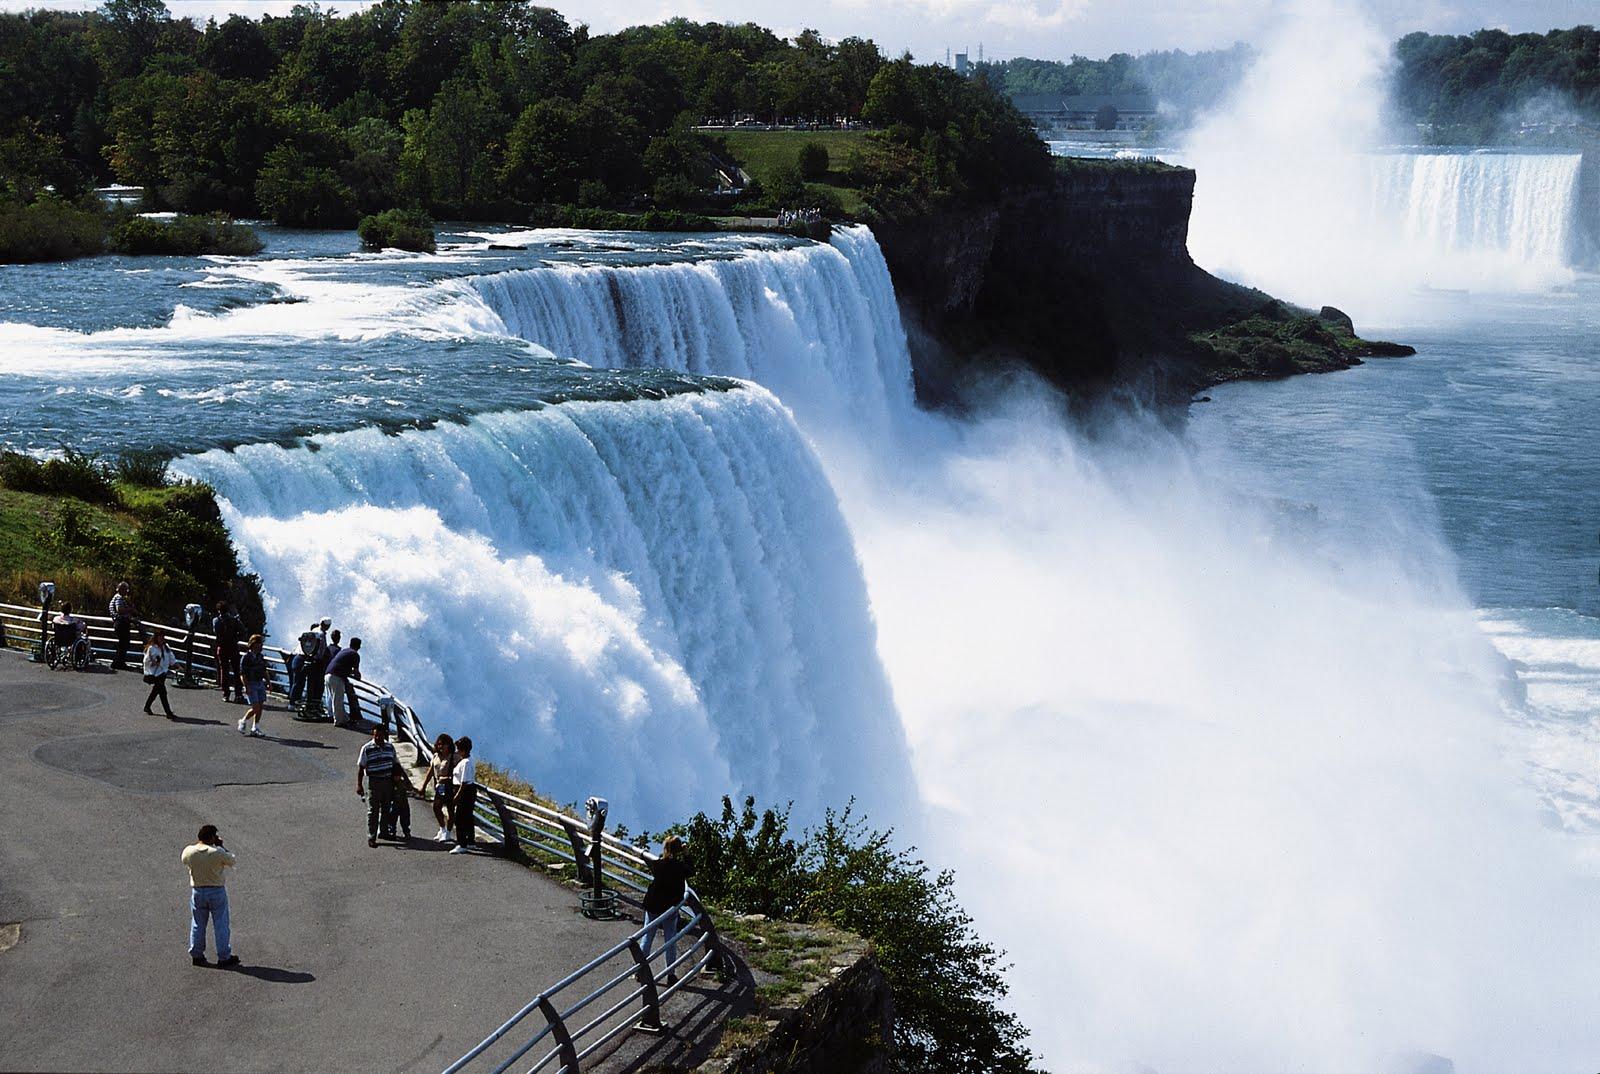 Acadex Voyager: Niagara Falls,Buffalo, NY